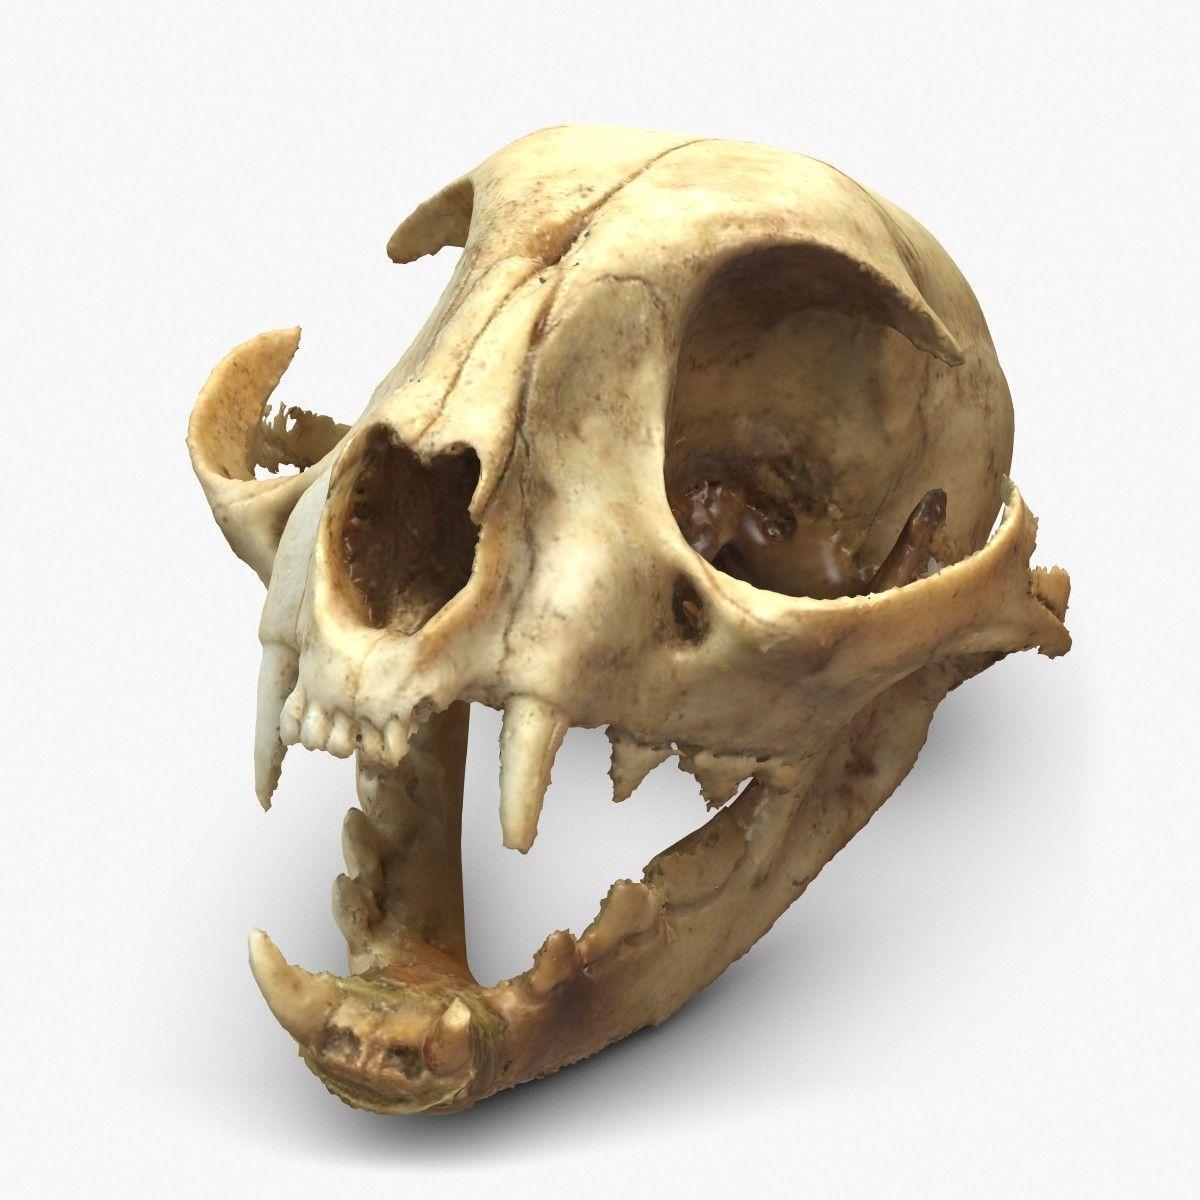 3d c skull scan model | Органика | Pinterest | Cat skull, 3d and ...